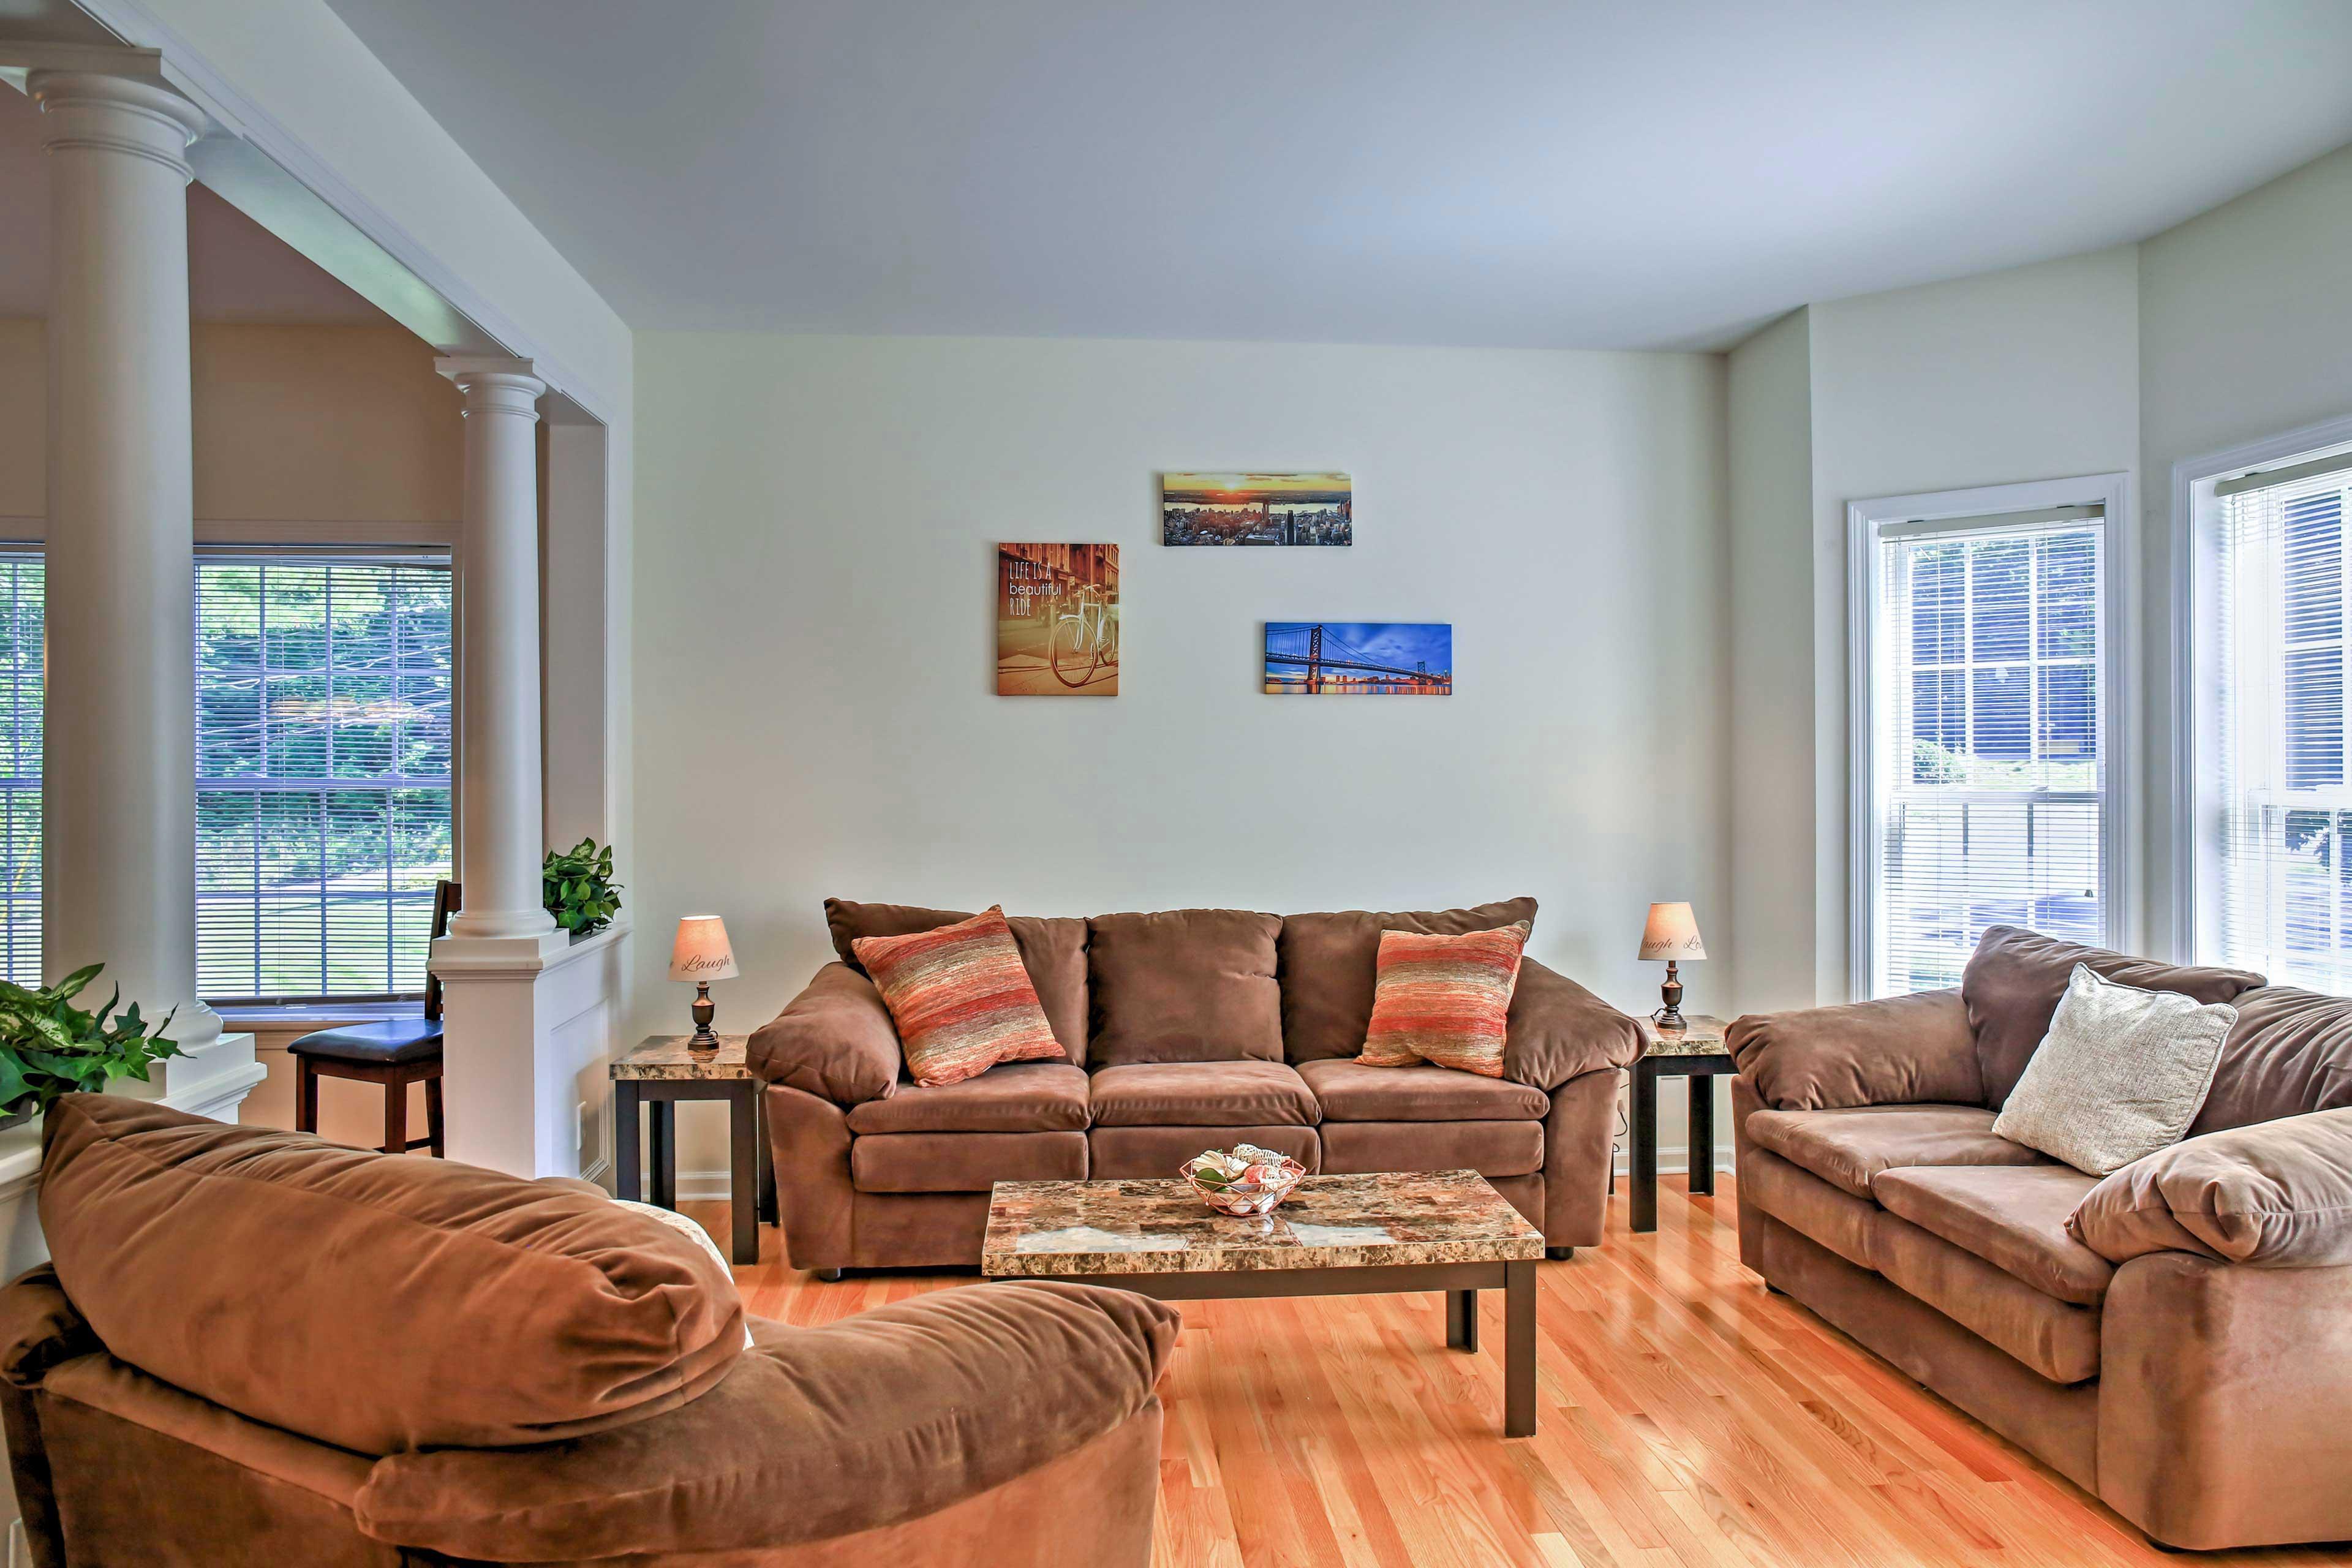 The sitting room provides comfortable plush furnishings.